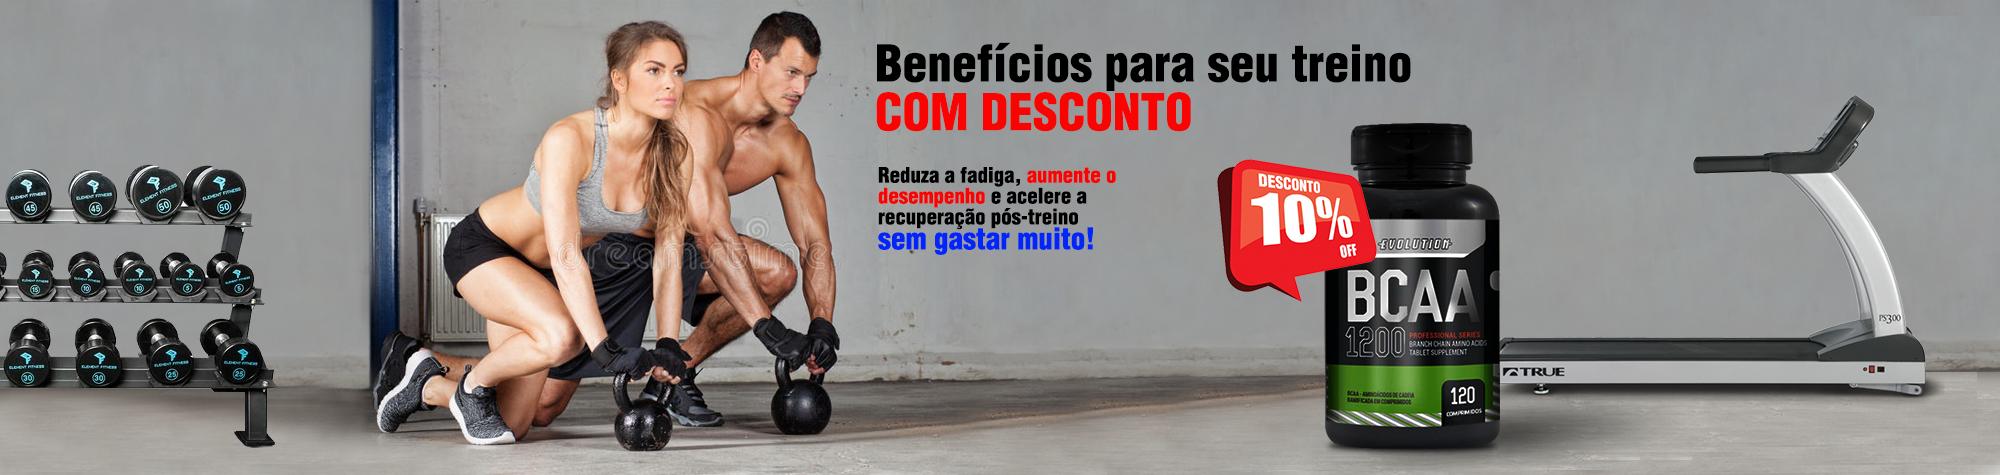 BCAA  para o crescimento e desenvolvimento muscular COM DESCONTO!